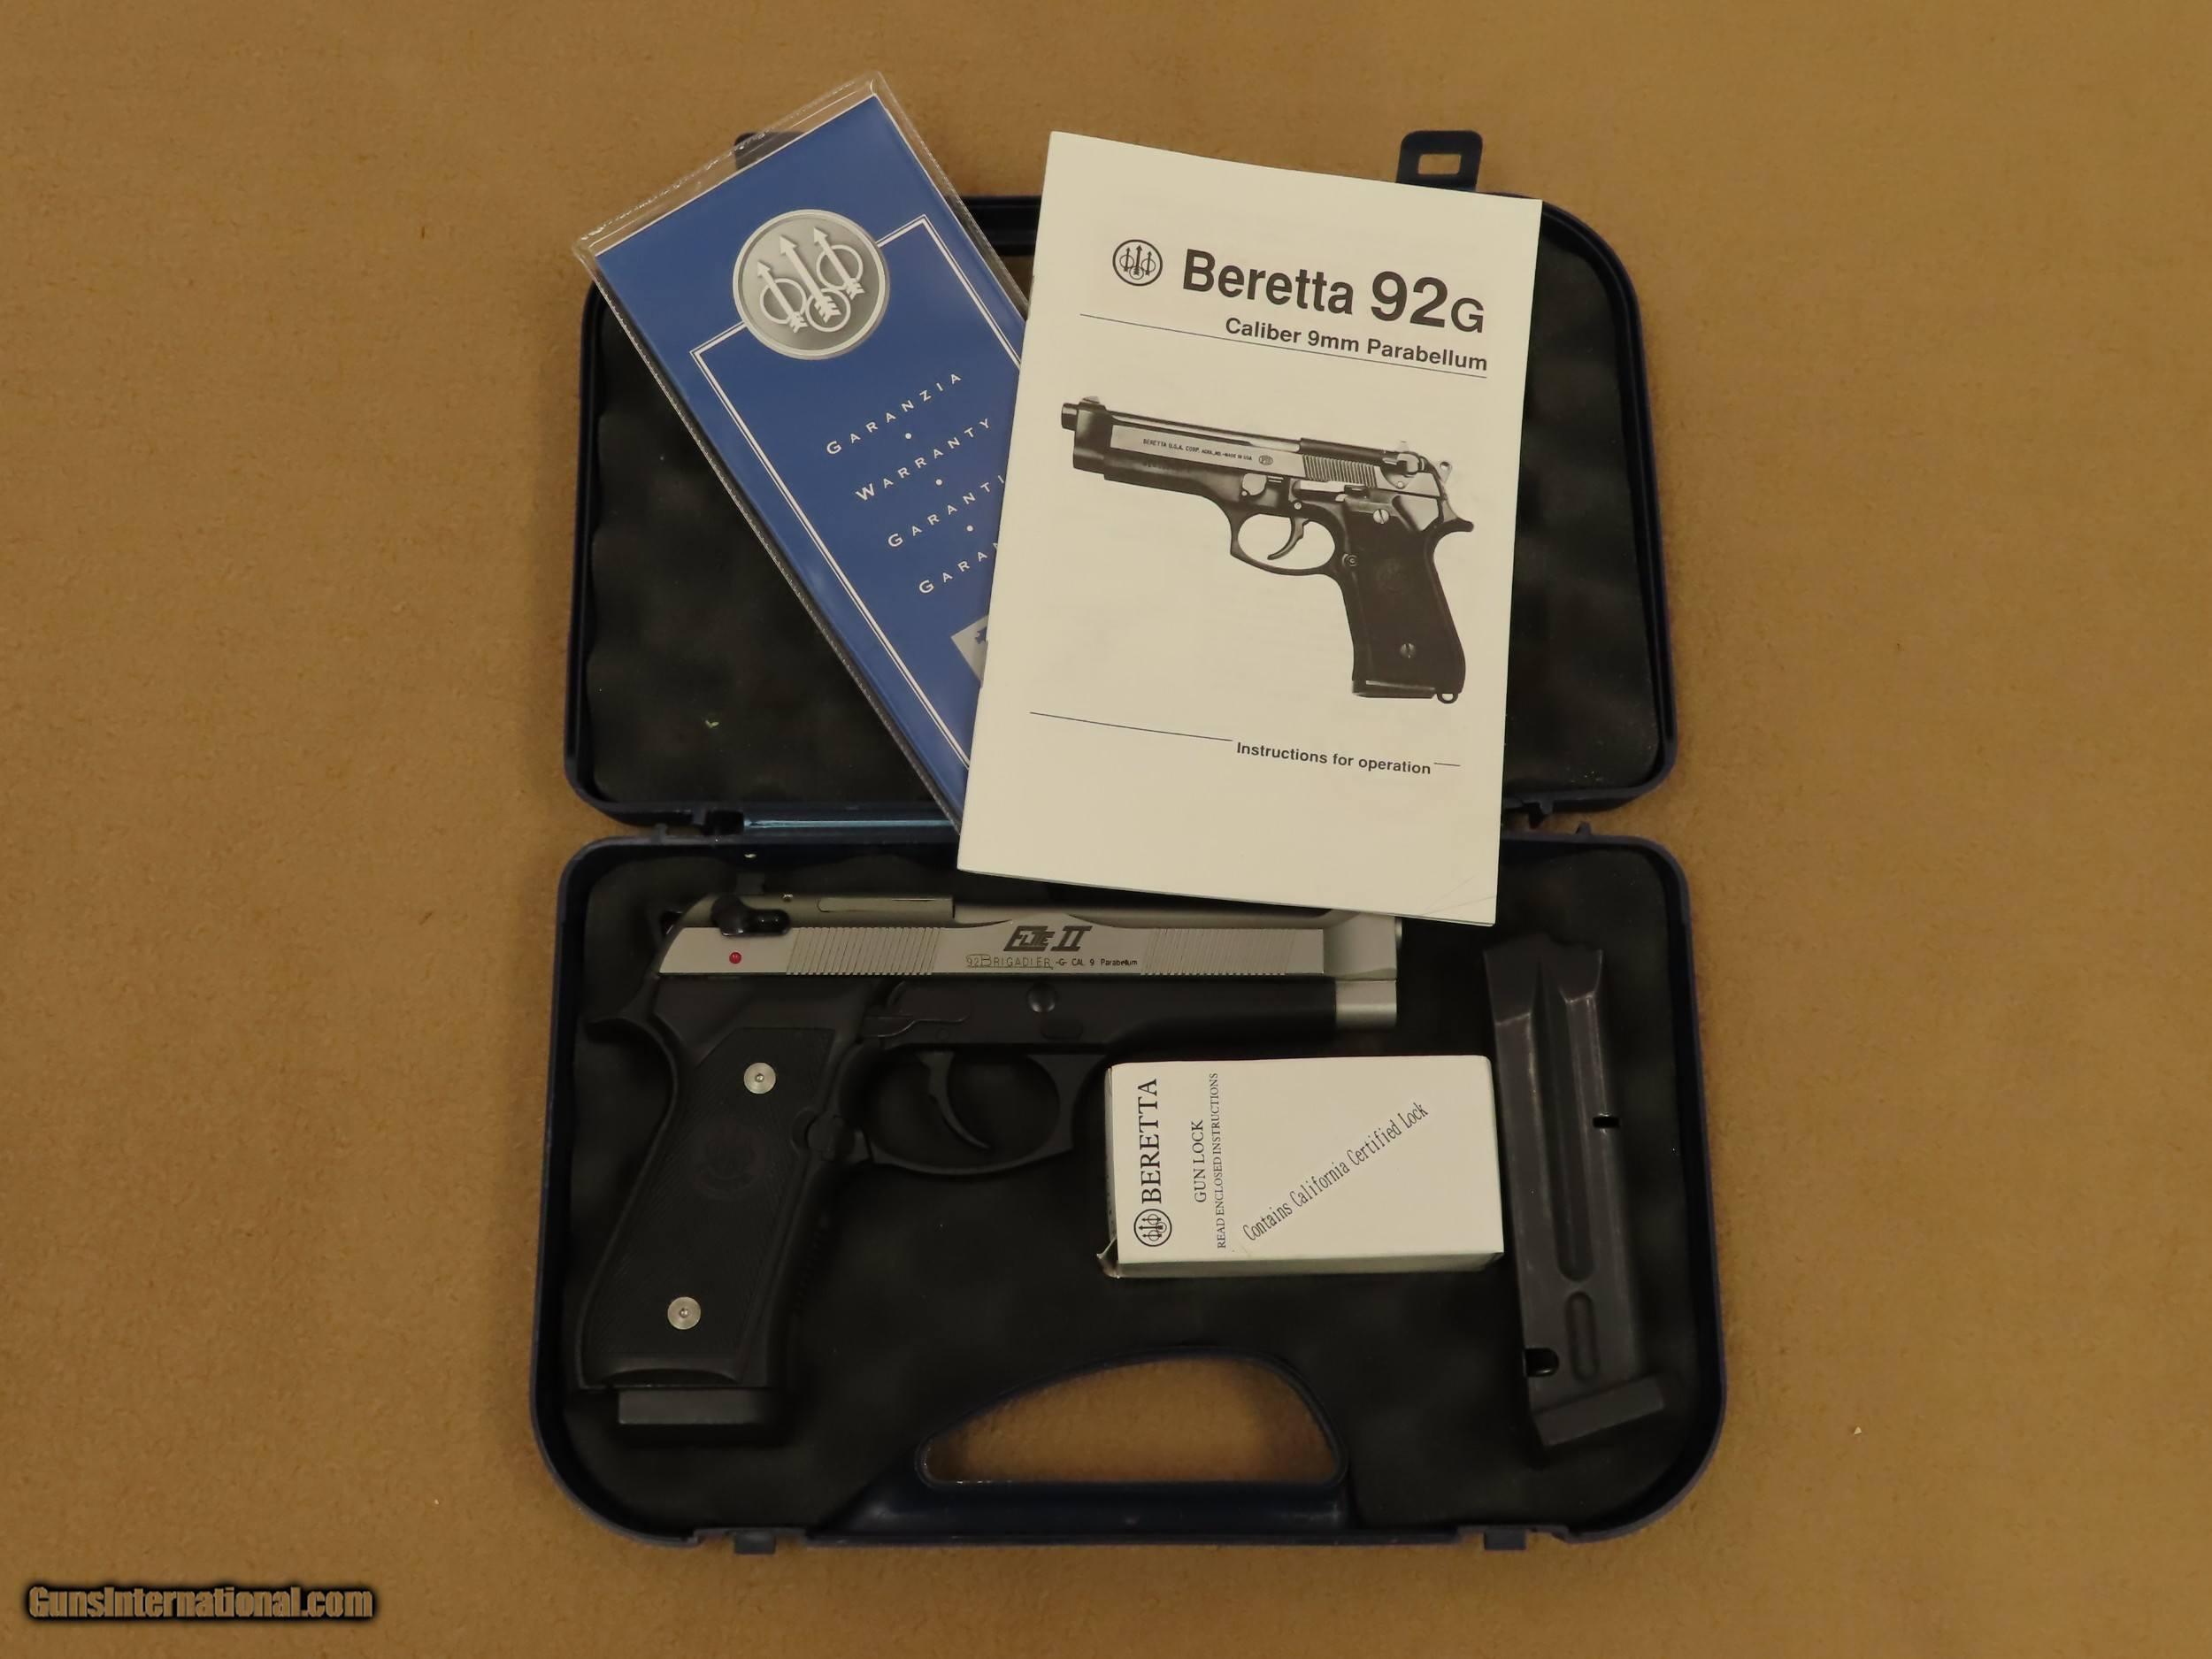 2003 Vintage Beretta Model 92G Elite II Brigadier 9mm Pistol w